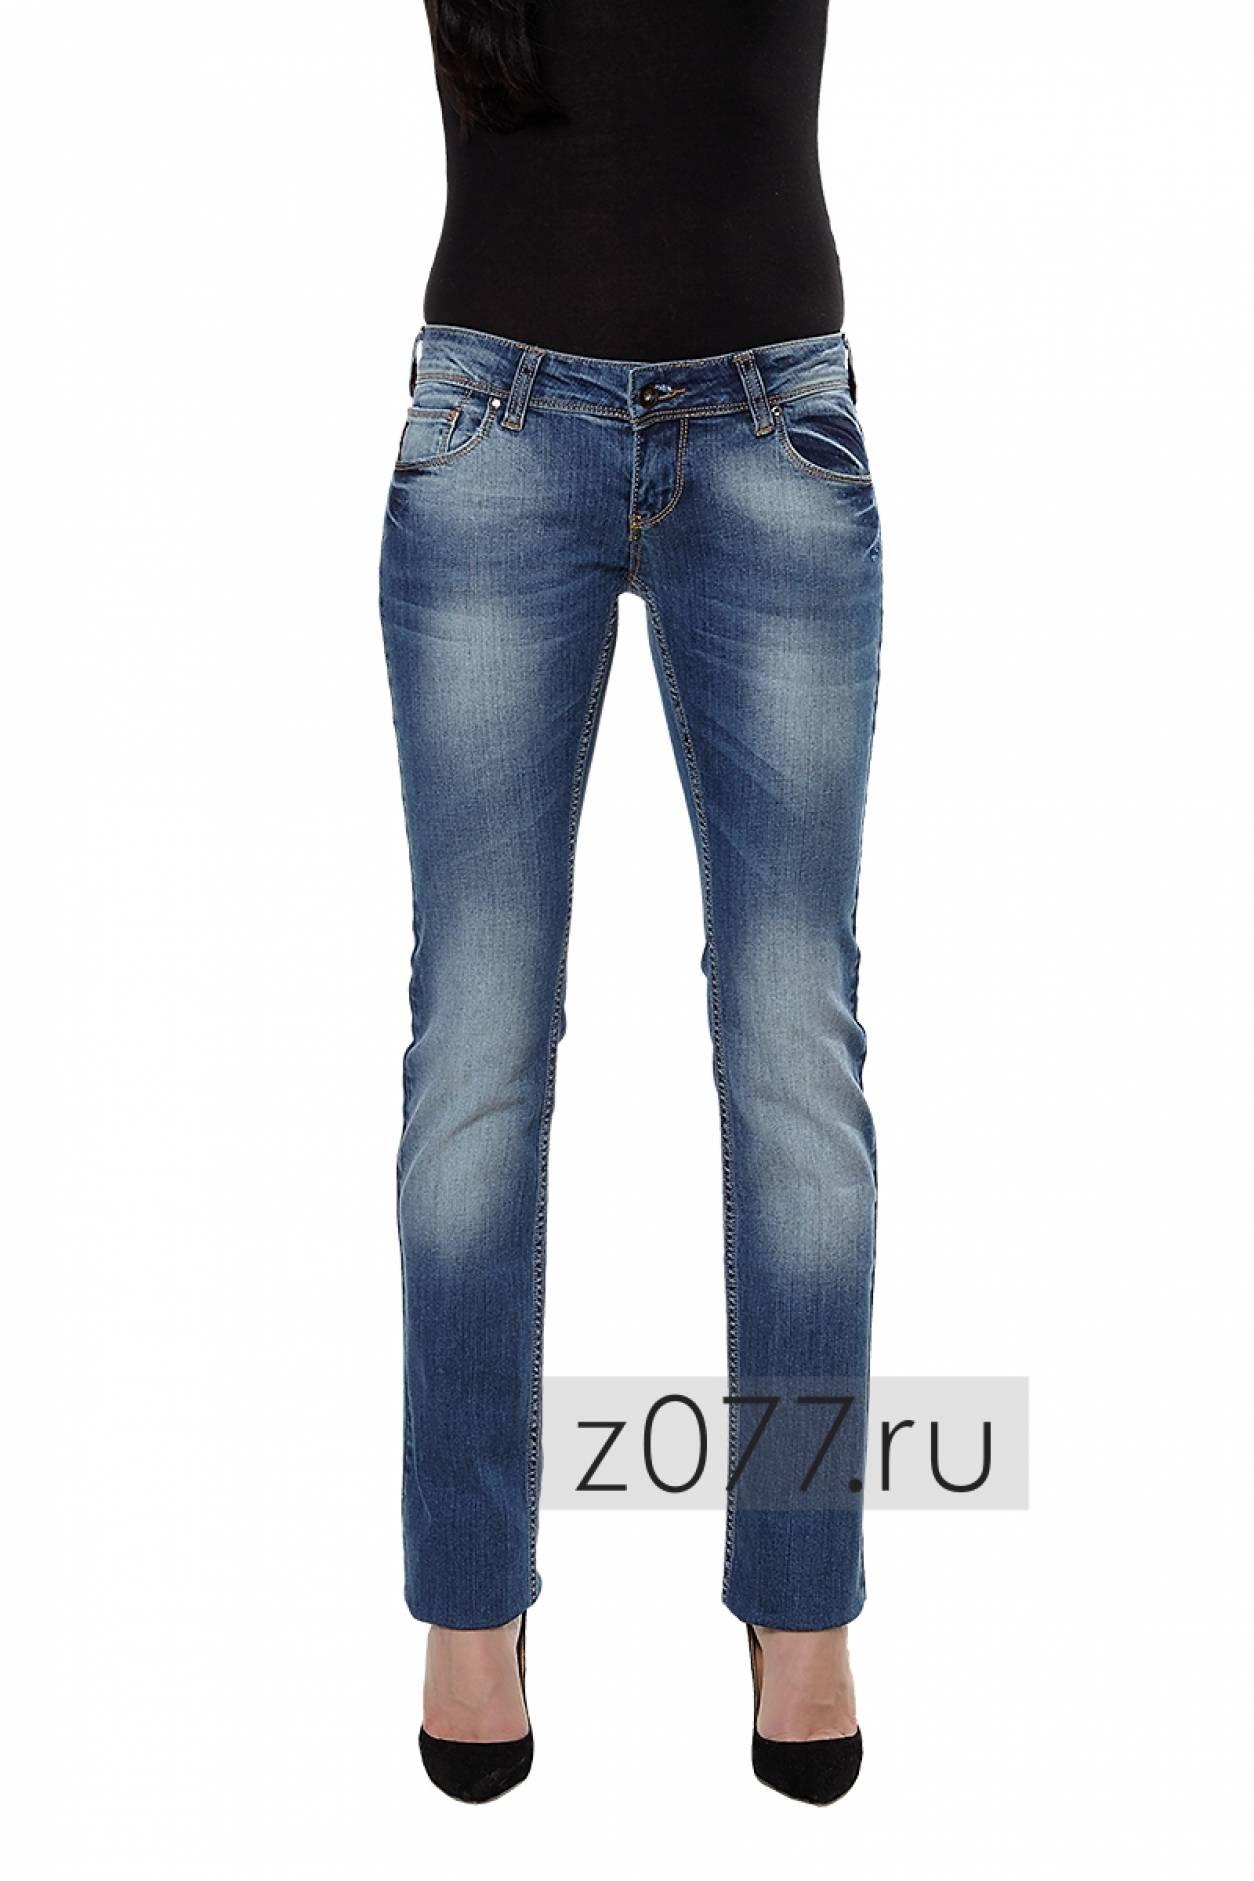 Армани джинс интернет магазин